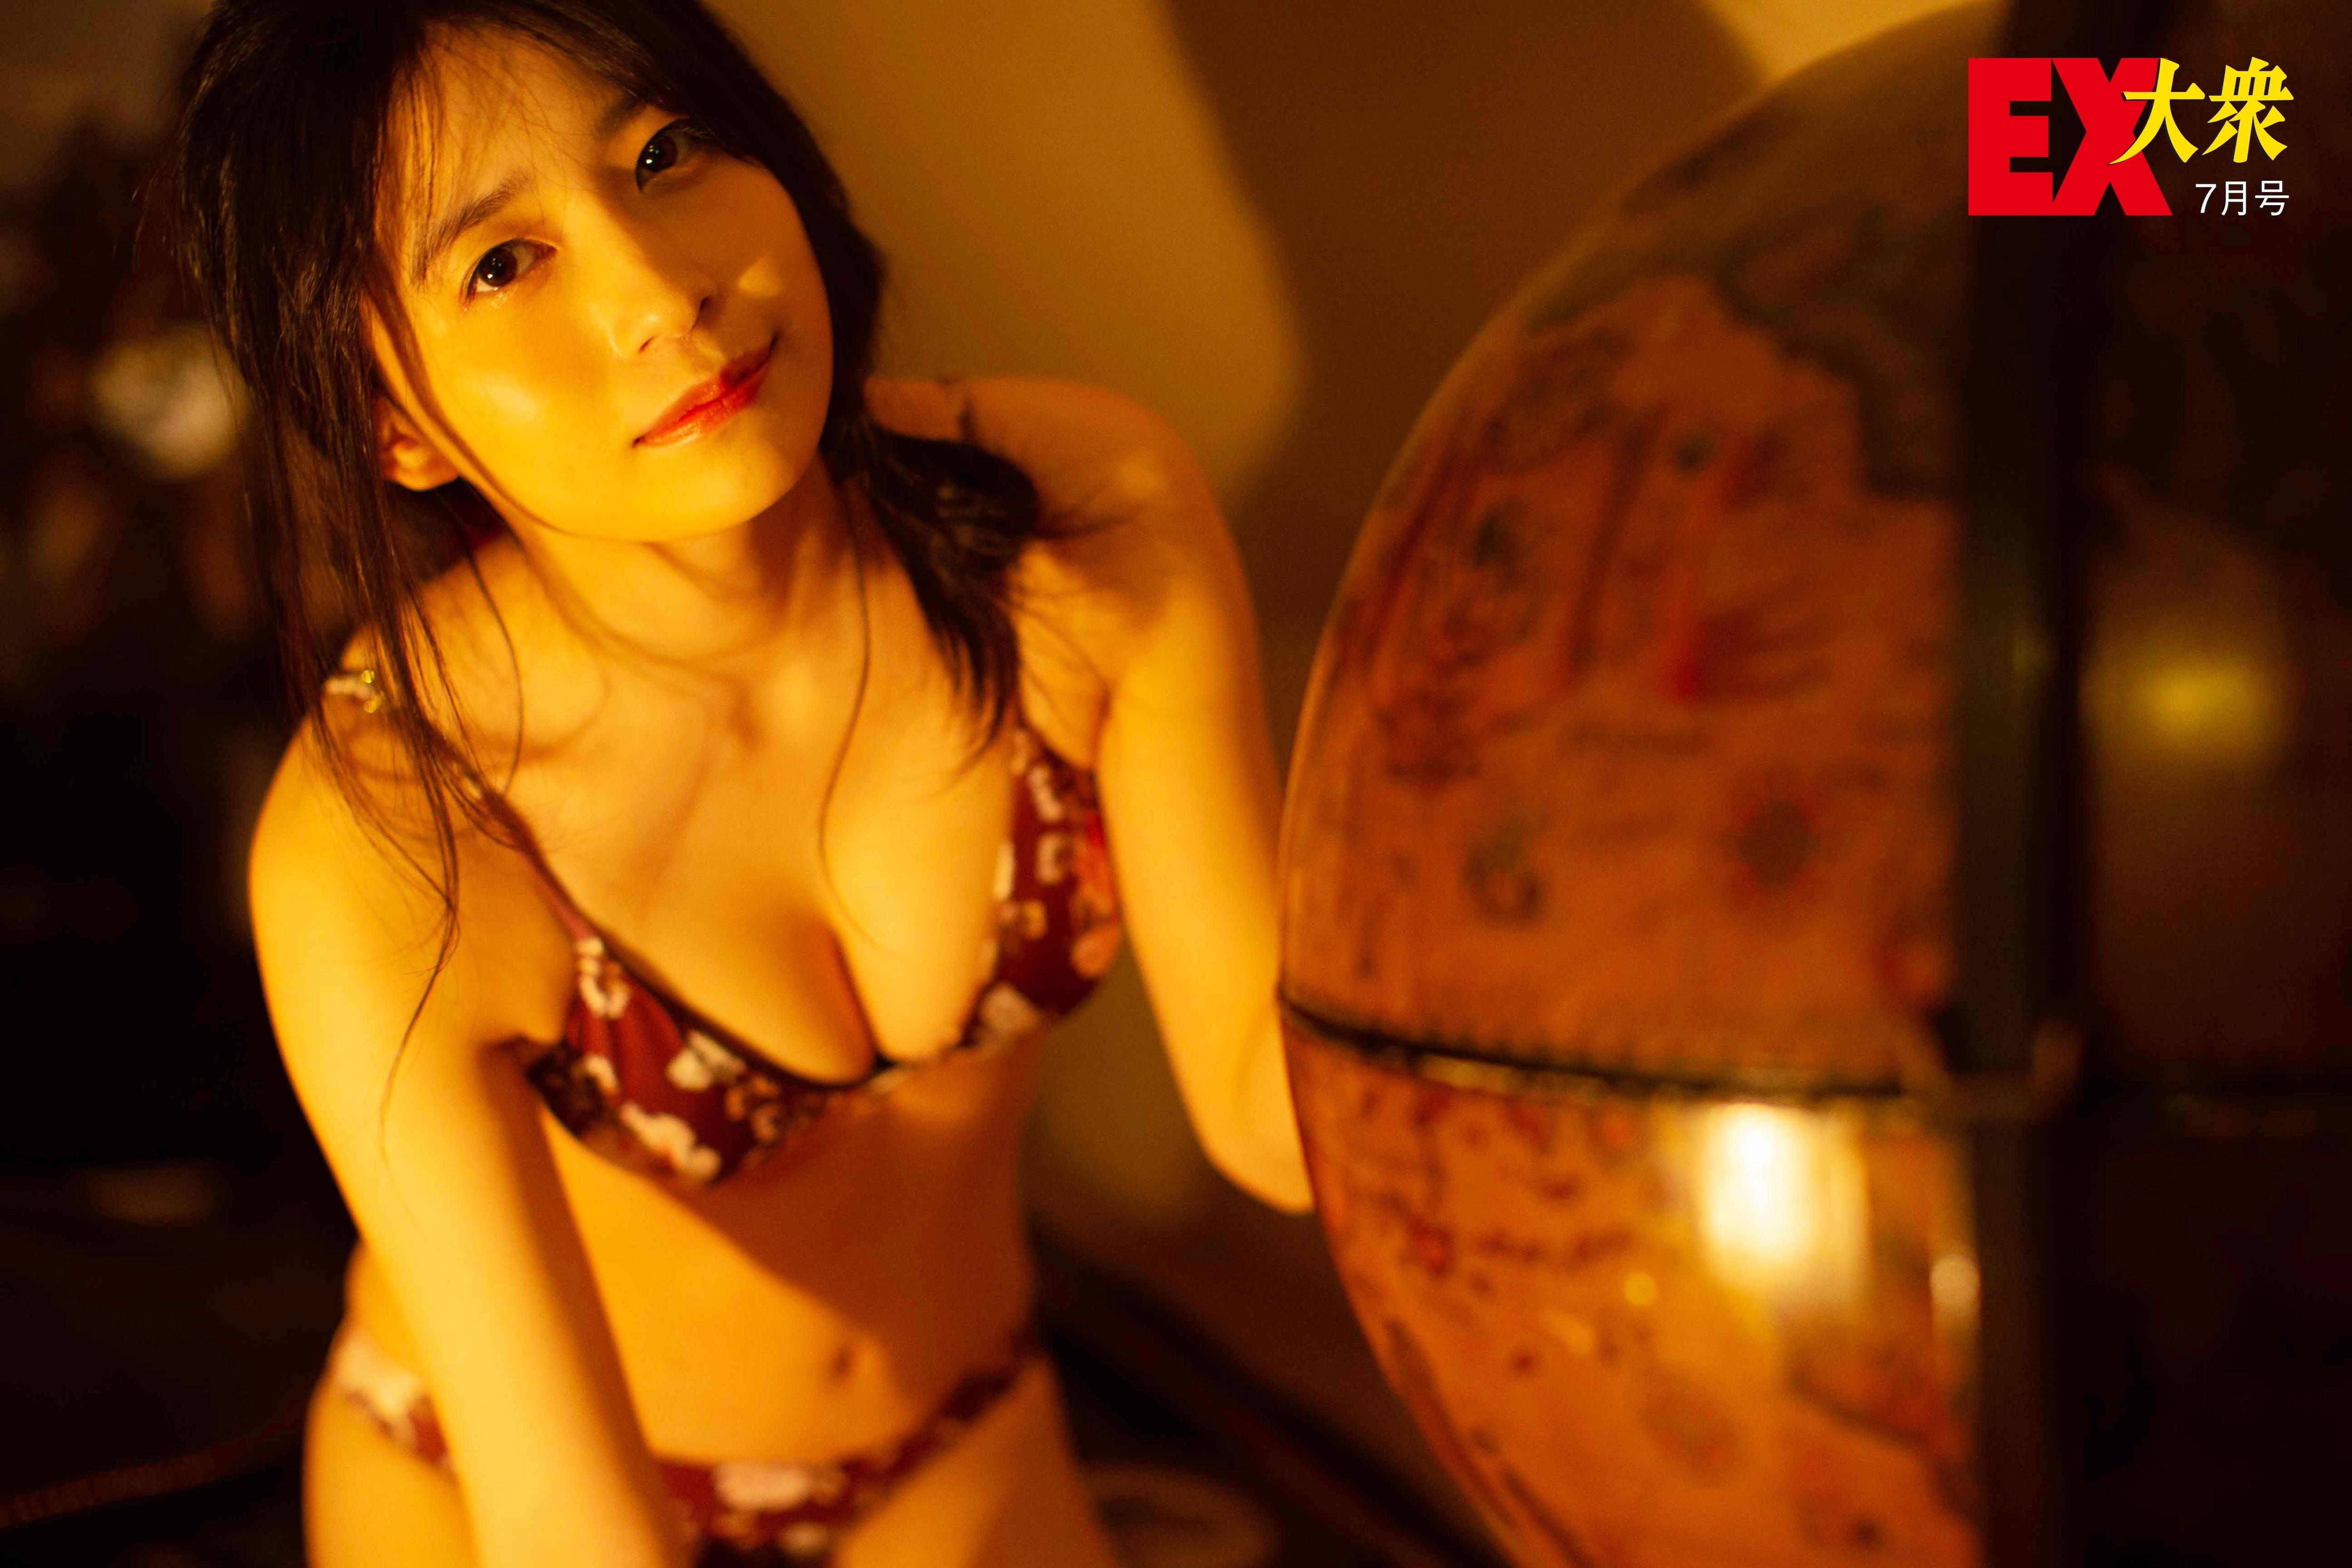 AKB48佐々木優佳里の本誌未掲載カット4枚を大公開!【EX大衆7月号】の画像003